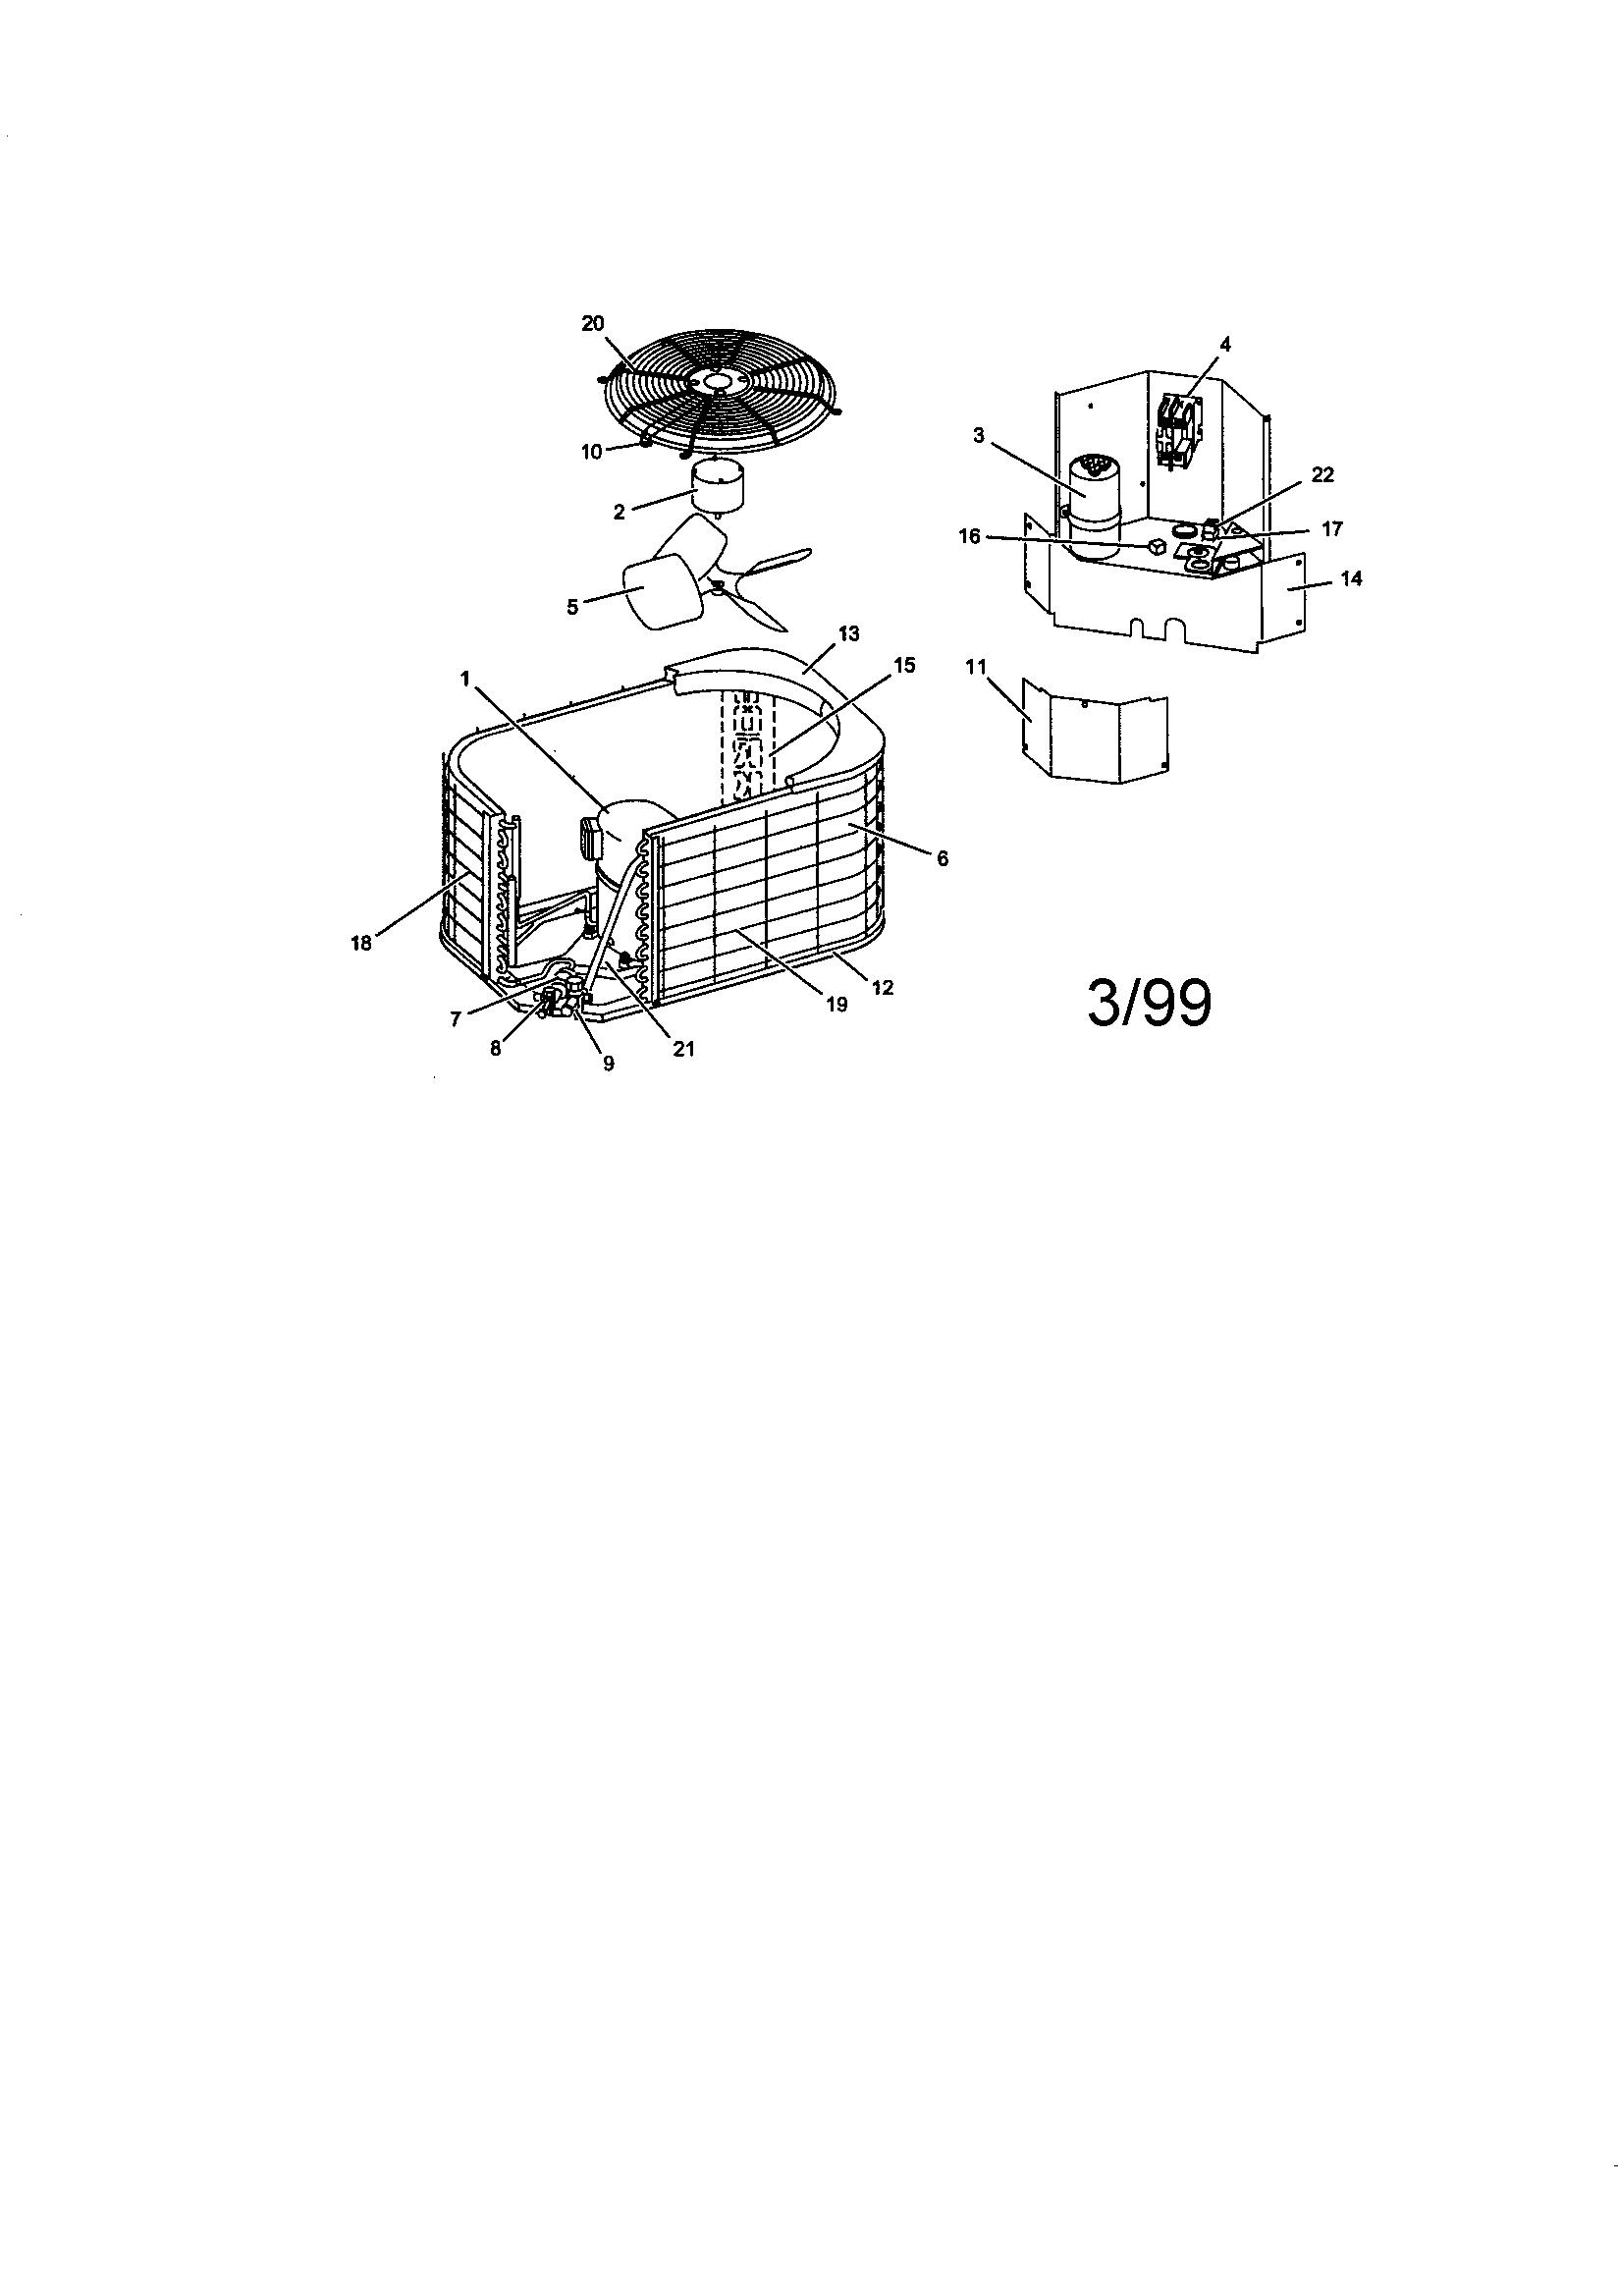 york heat pump package unit wiring diagram 2006 chevy cobalt carrier rooftop diagrams get free image